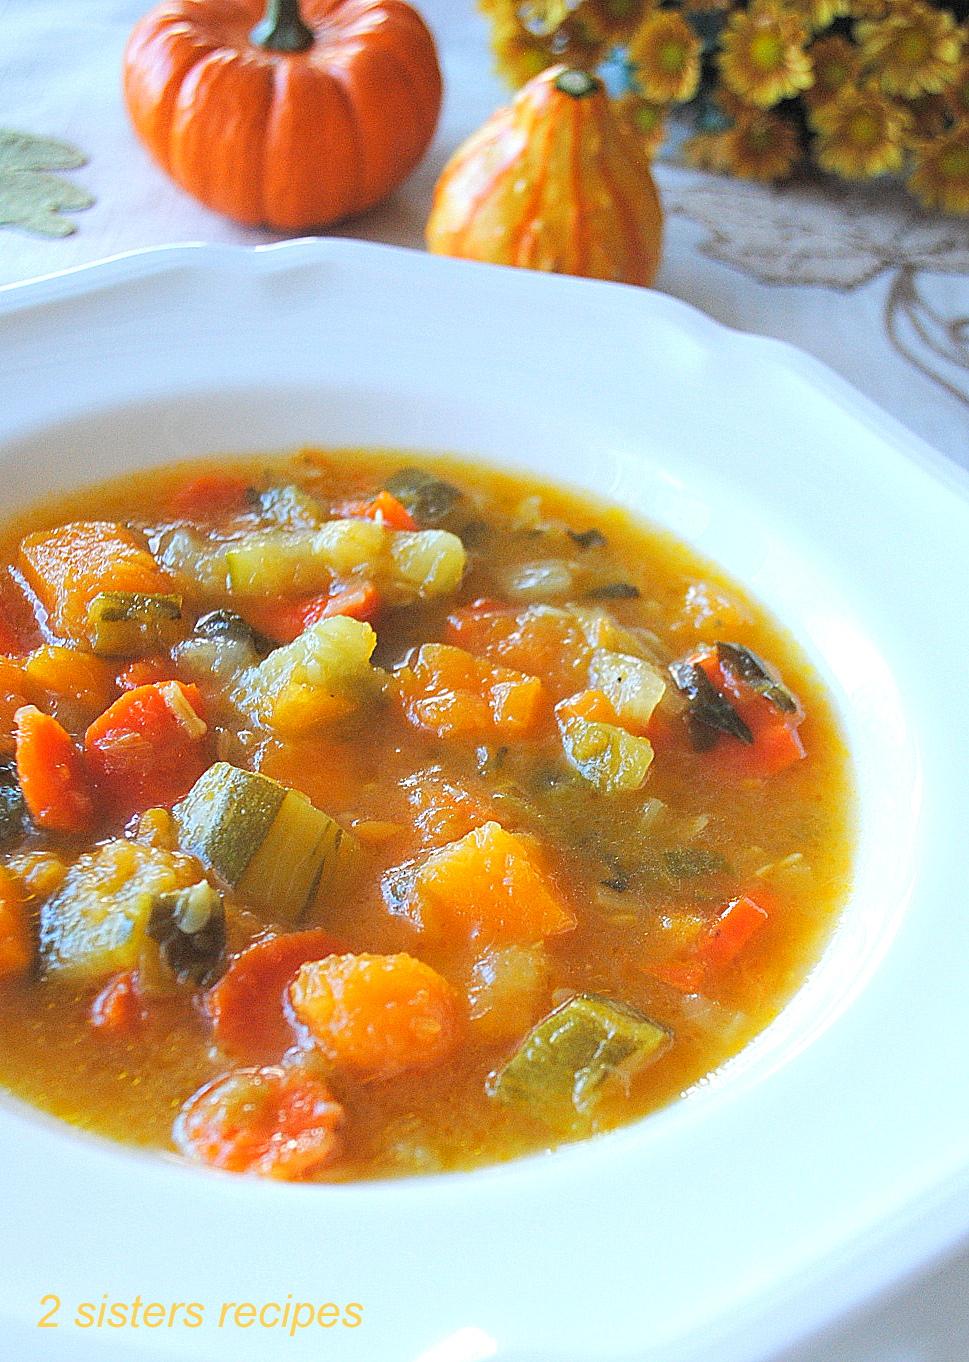 Healthy Butternut Squash Zucchini Soup by 2sistersrecieps.com